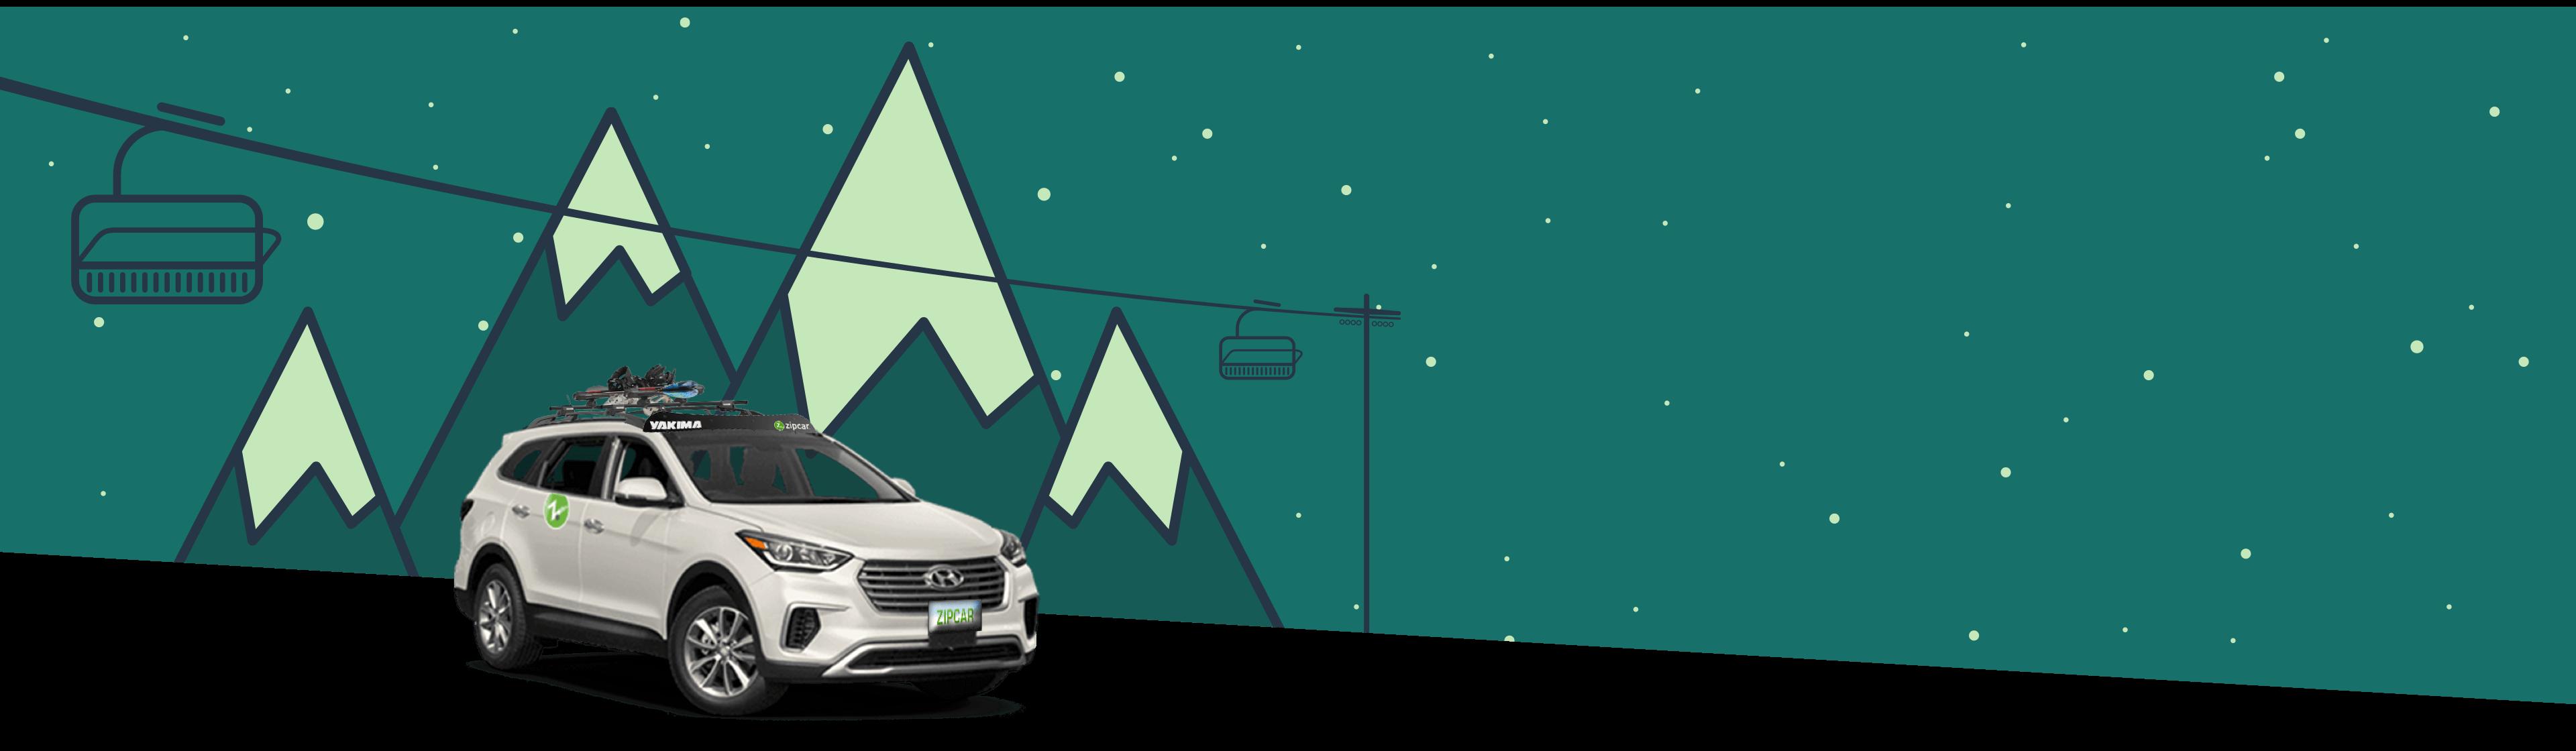 ski lift with zipcar